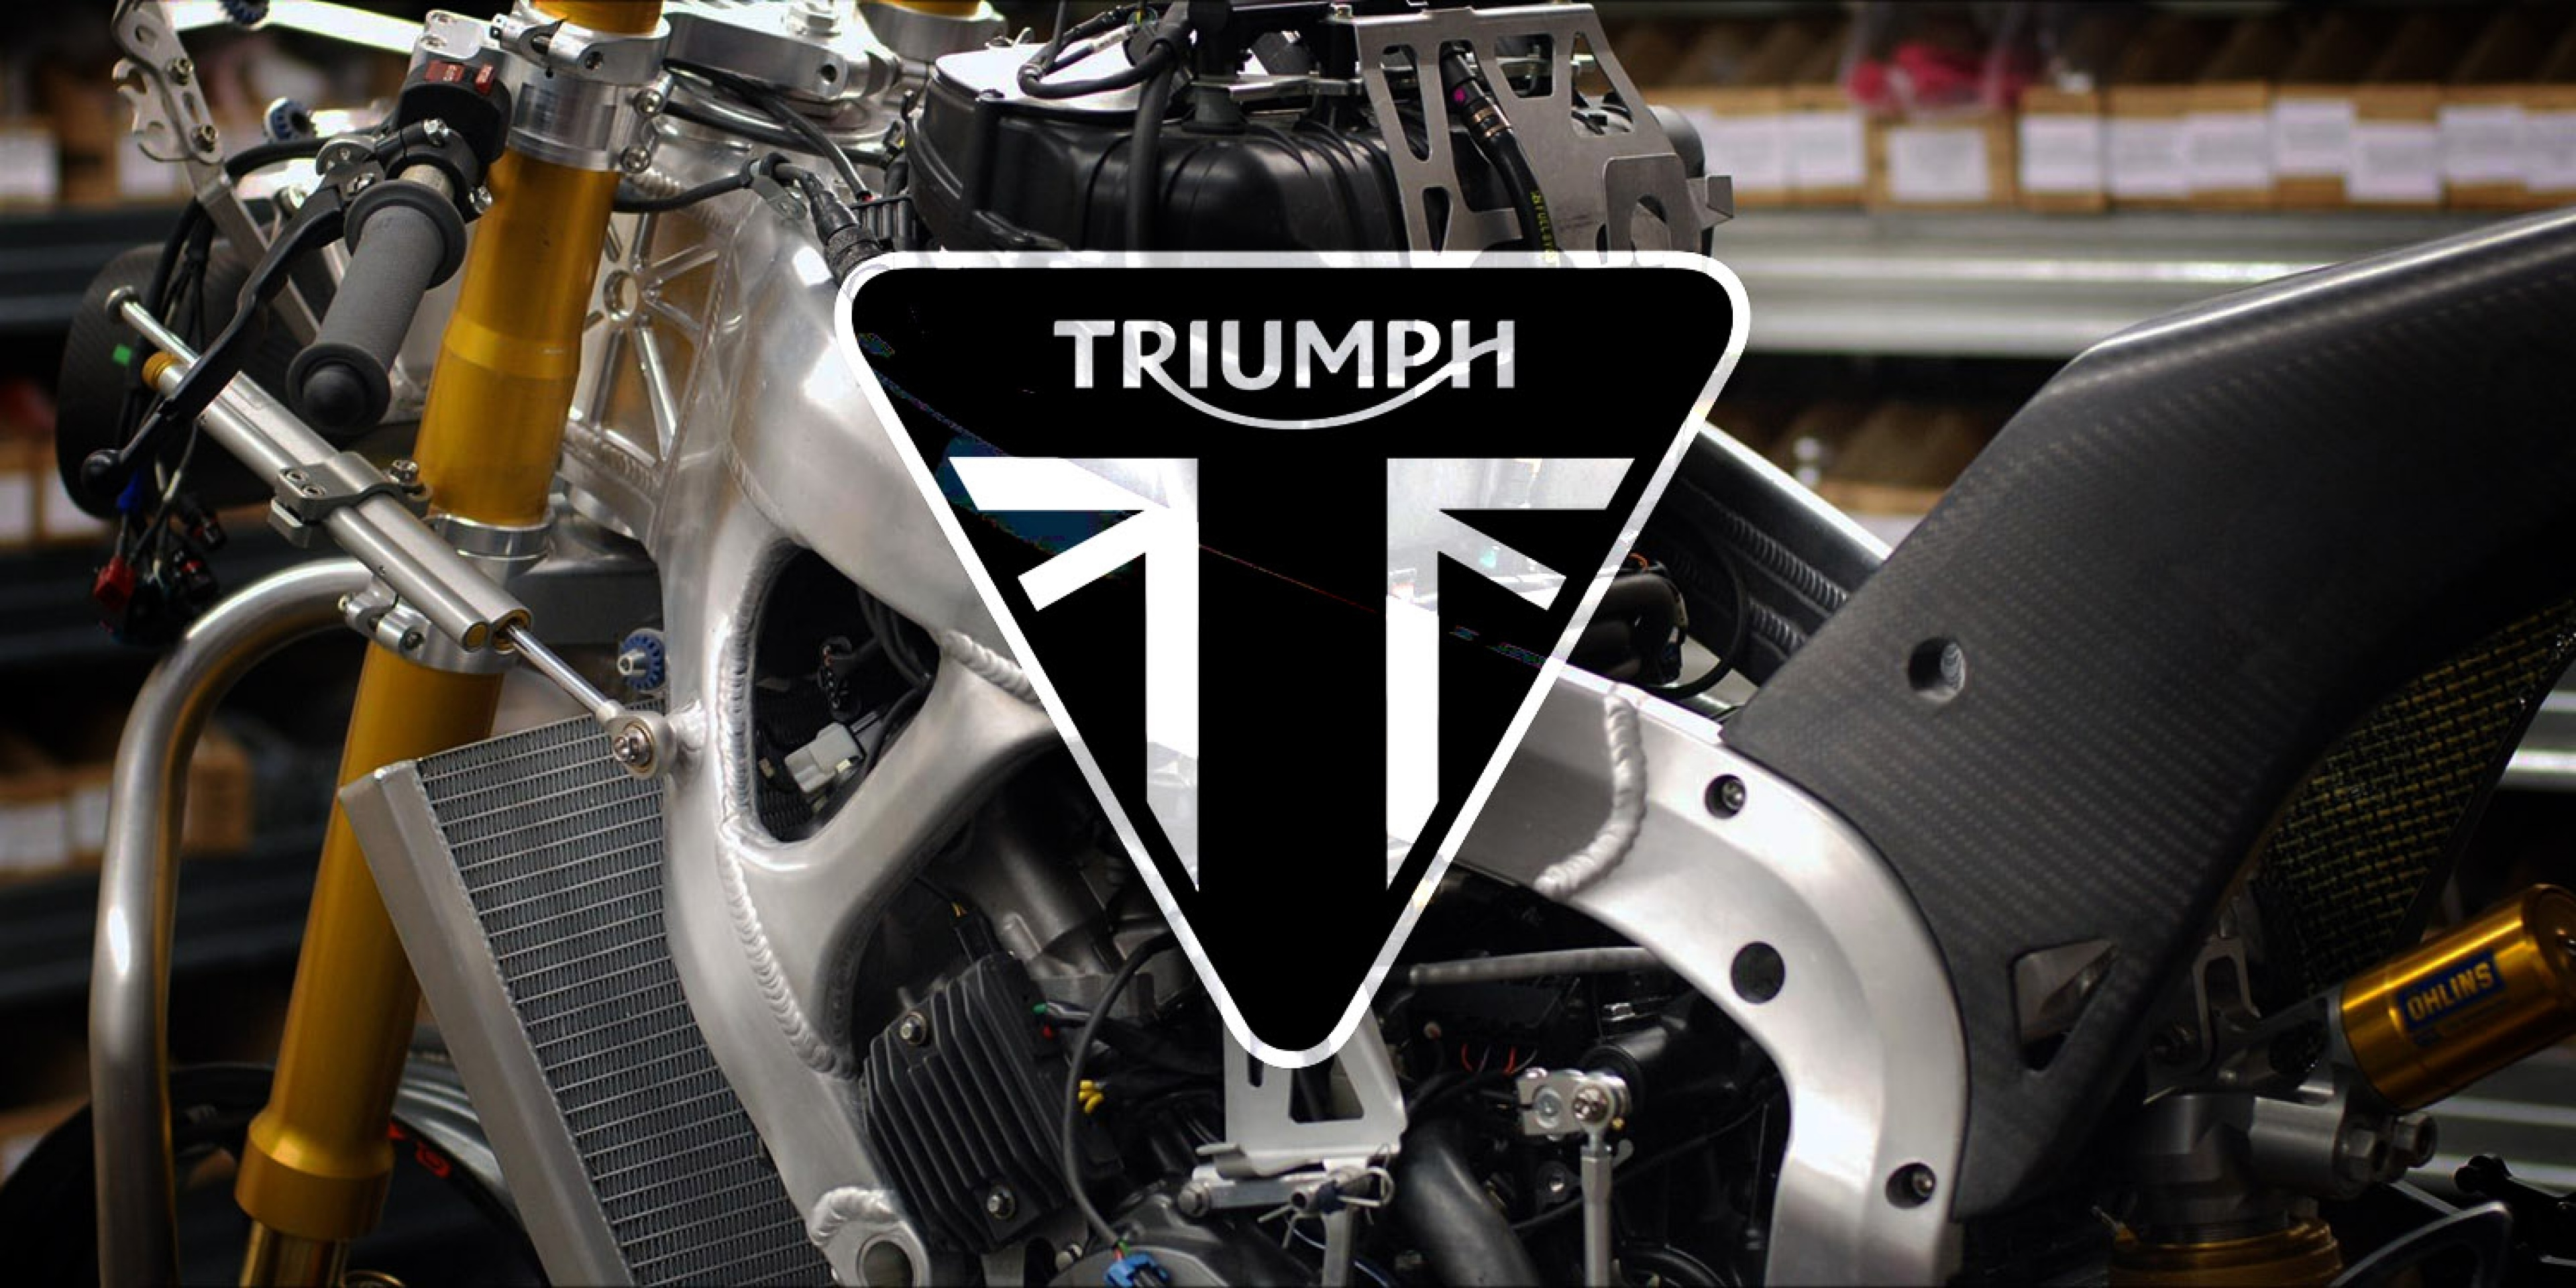 TRIUMPH 將成為2019 Moto2 賽事引擎供應商